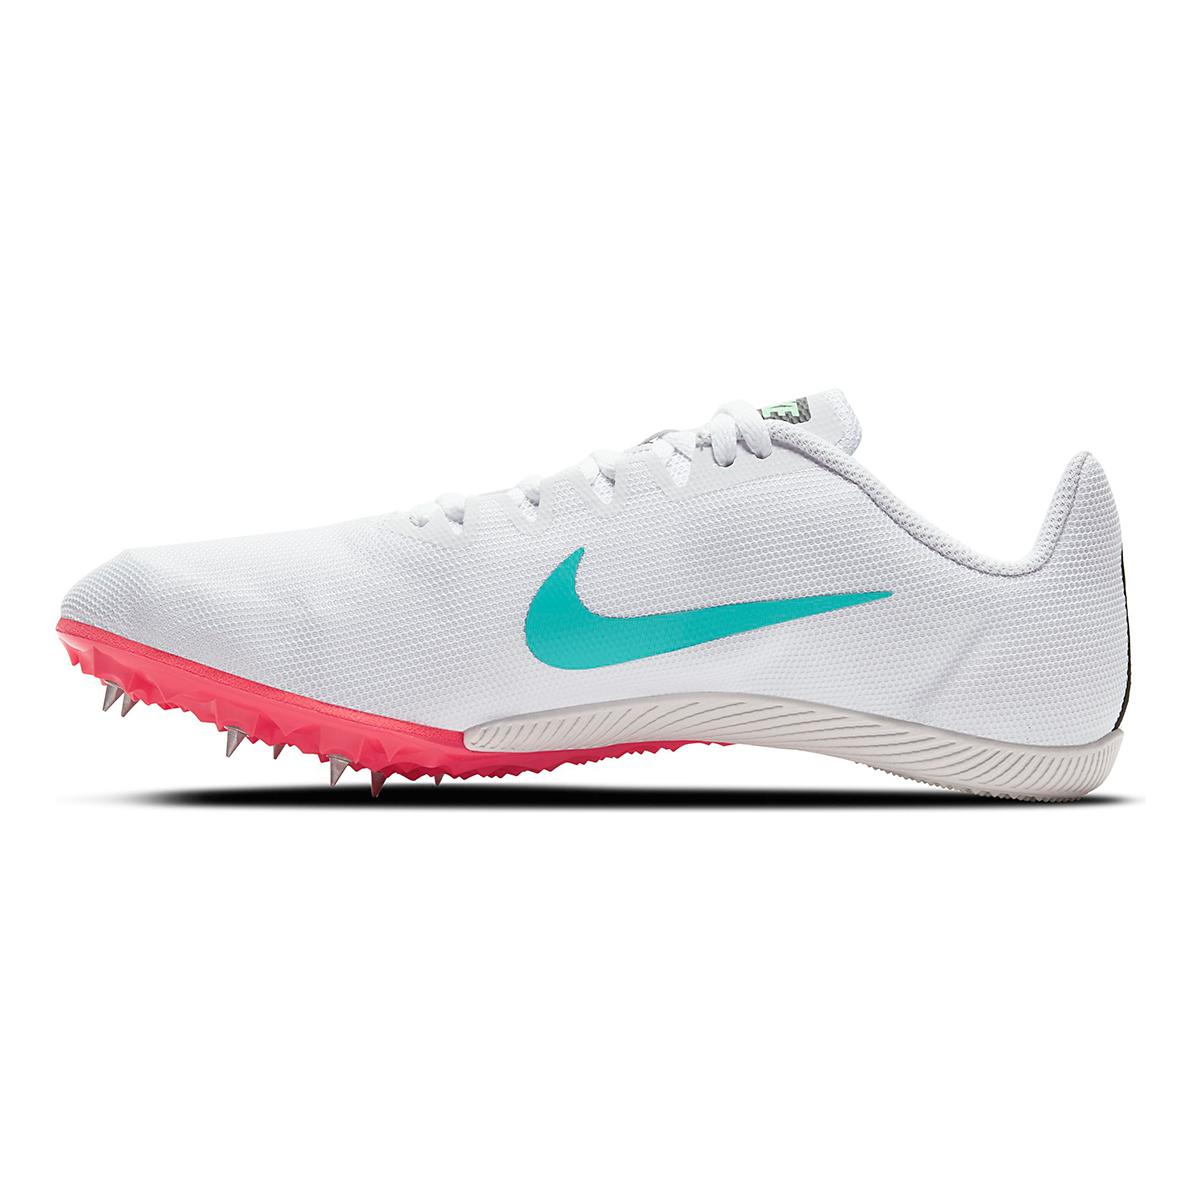 Nike Zoom Rival M 9 Track Spikes - Color: White/Flash Crimson/Hyper Jade/Black - Size: M4/W5.5 - Width: Regular, White/Flash Crimson/Hyper Jade/Black, large, image 2